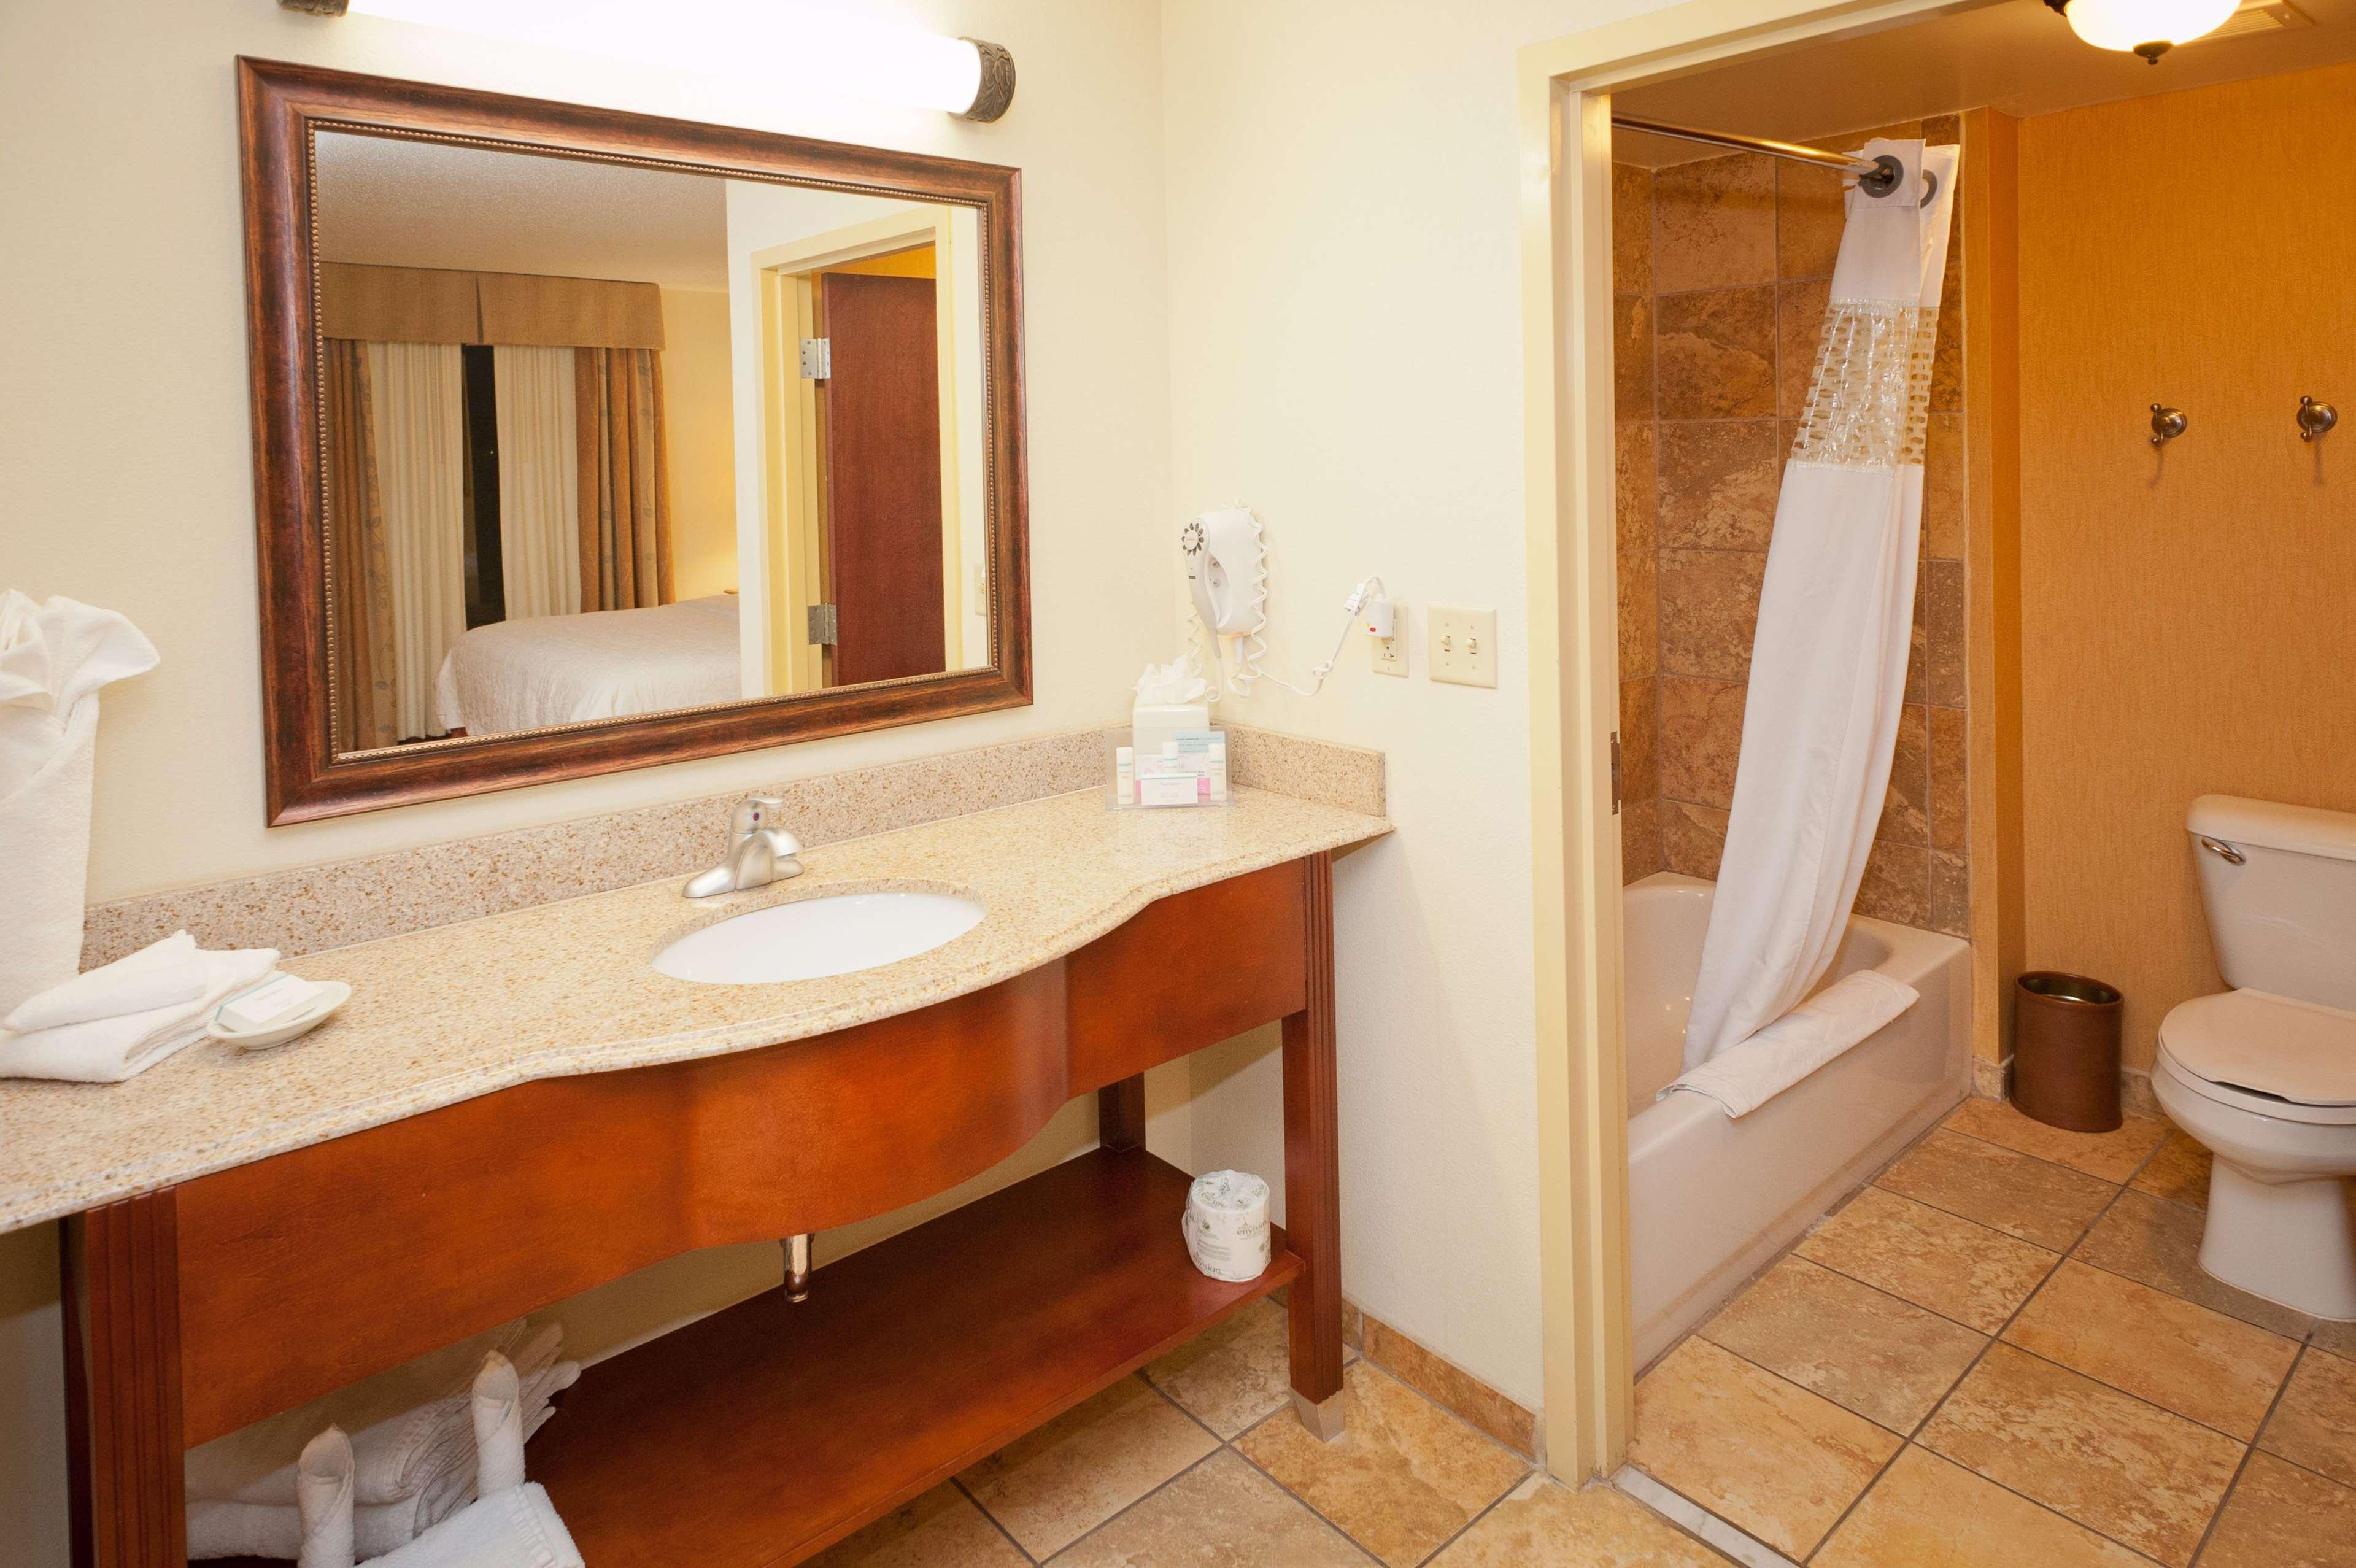 Hampton Inn & Suites Thibodaux image 8